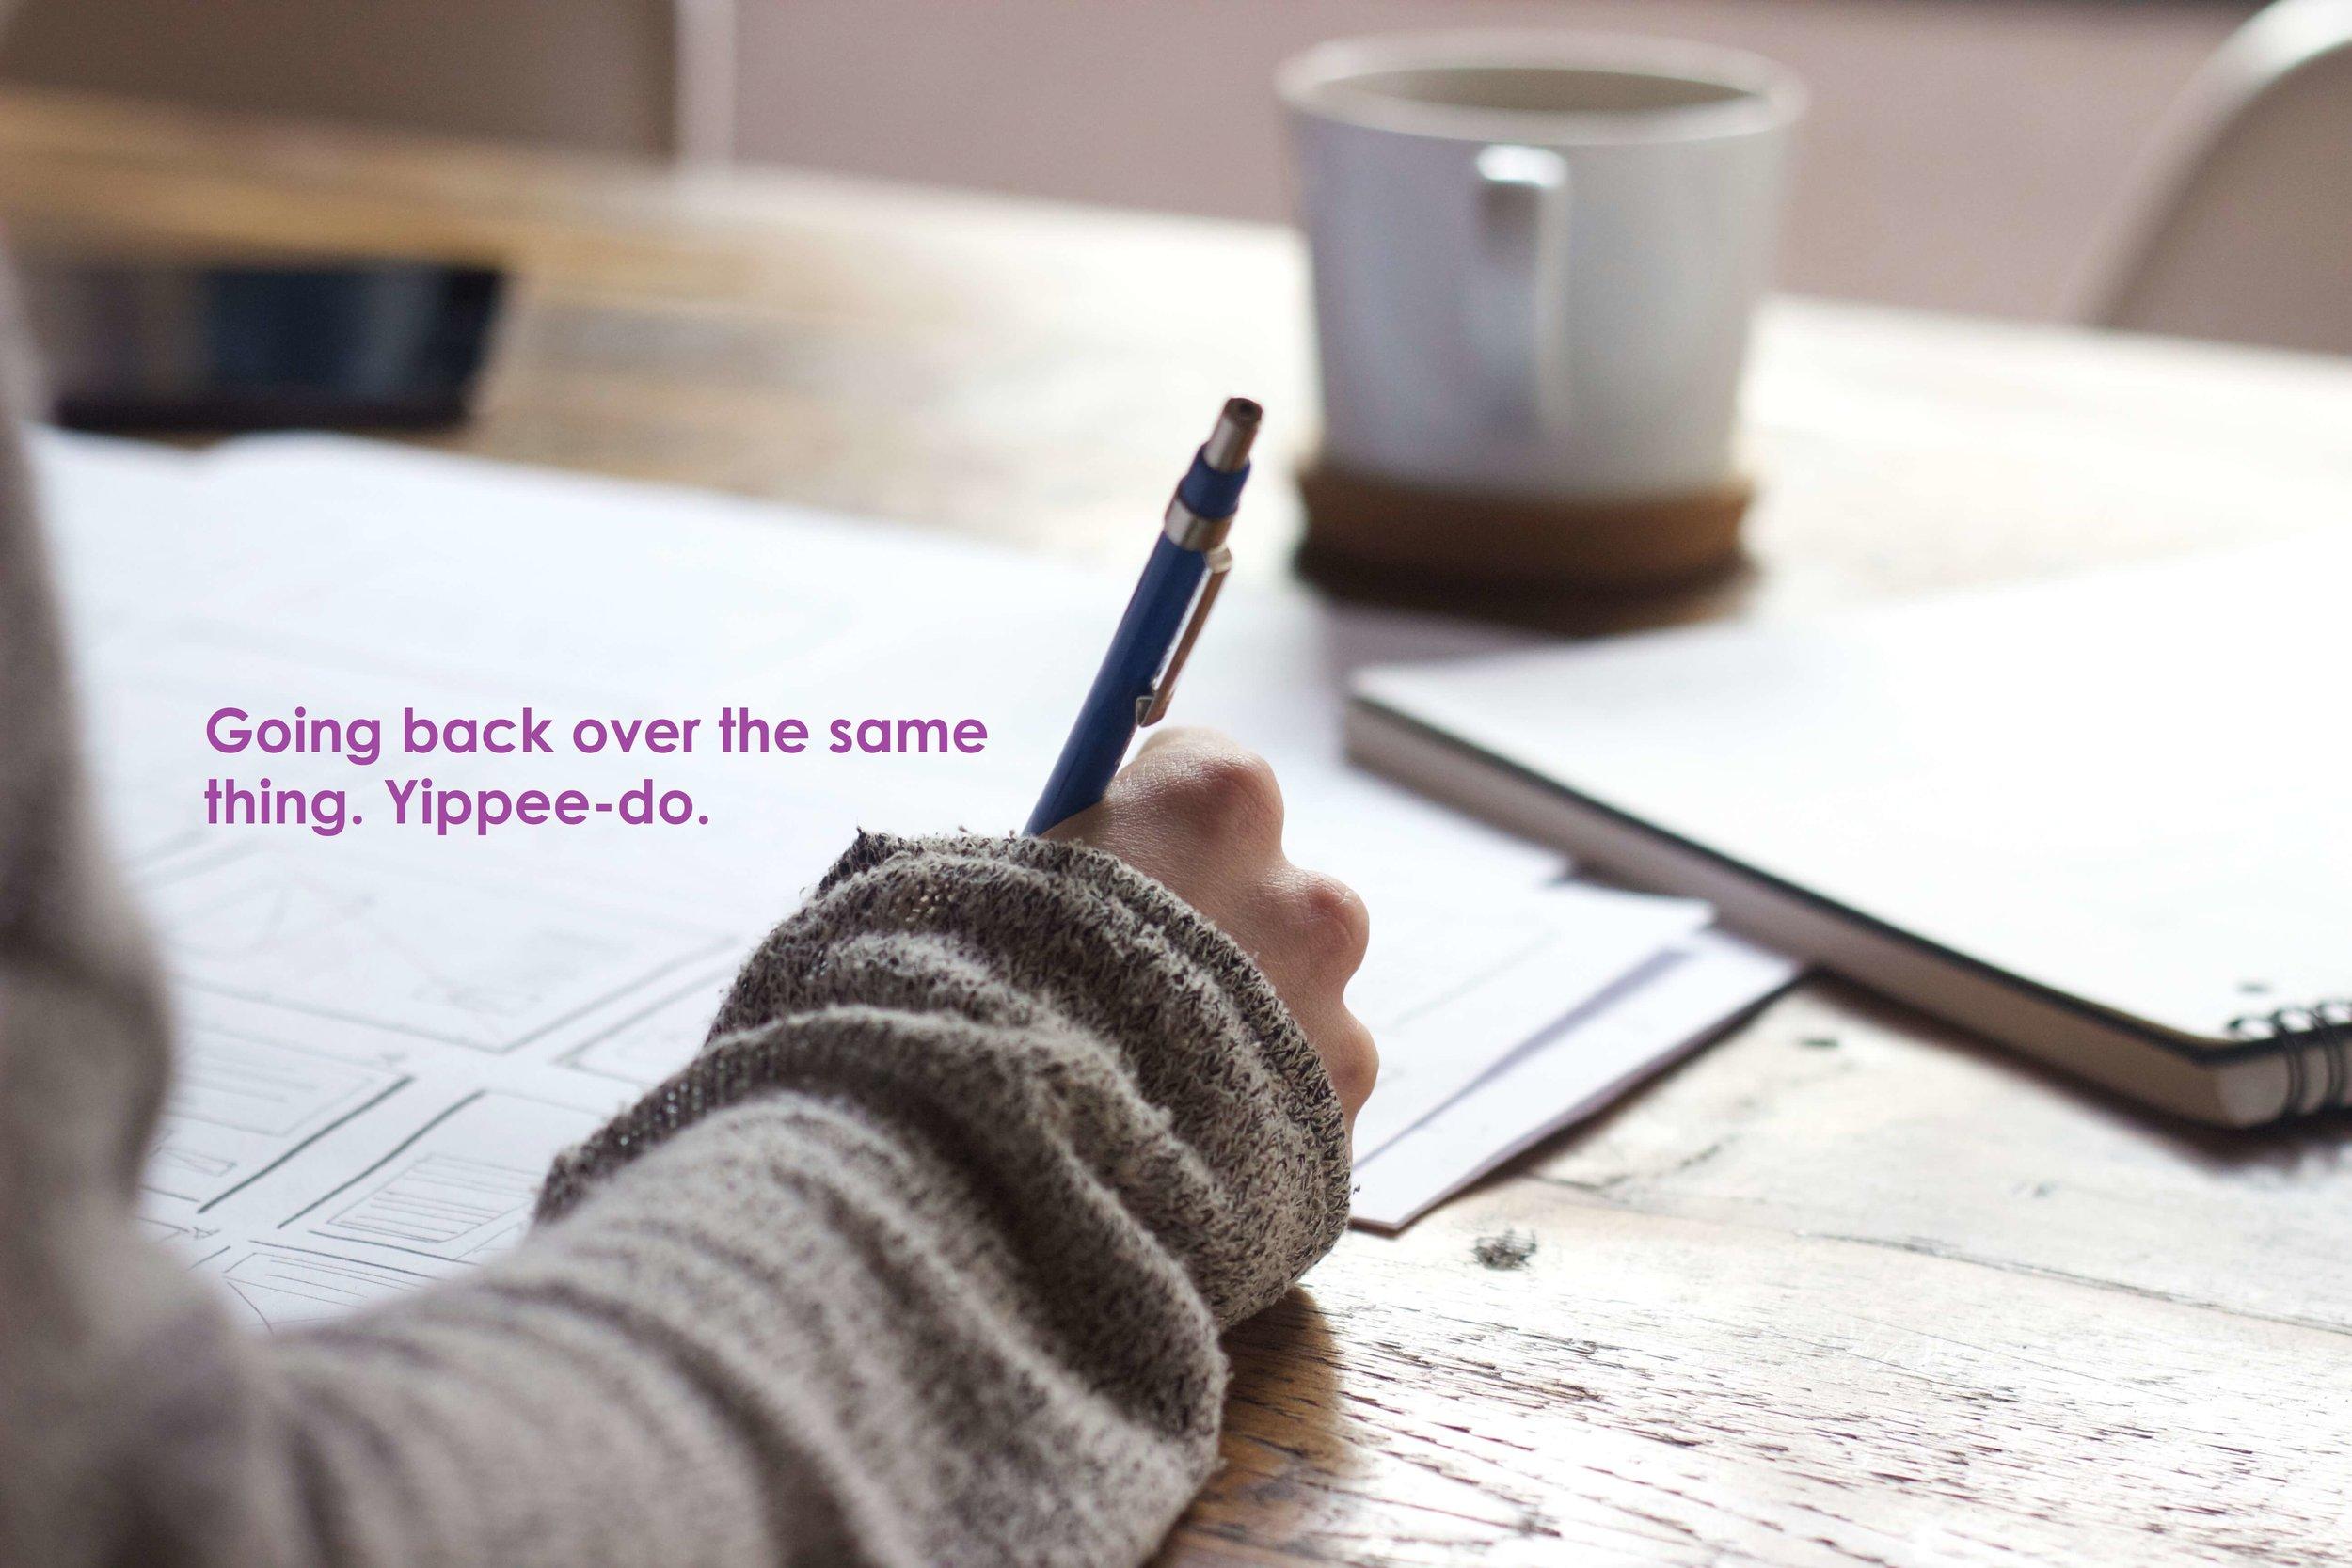 copywriting involves going back over old blog posts